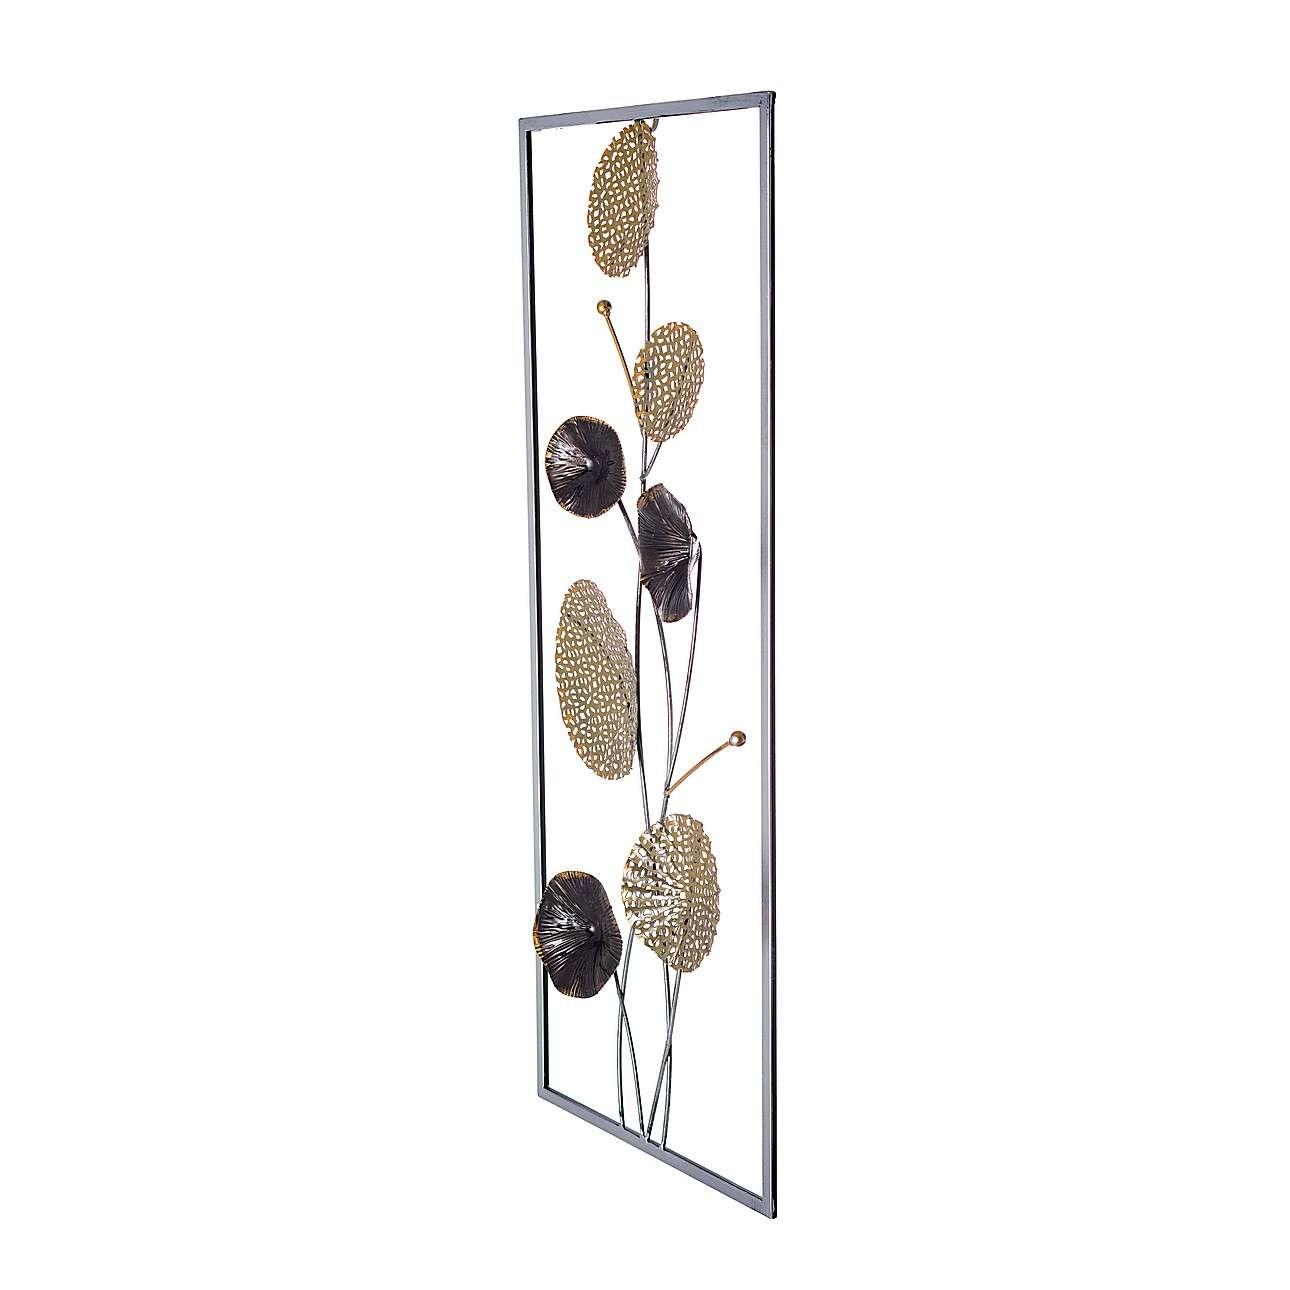 Wanddekoration Novia I 28,4x4x75cm